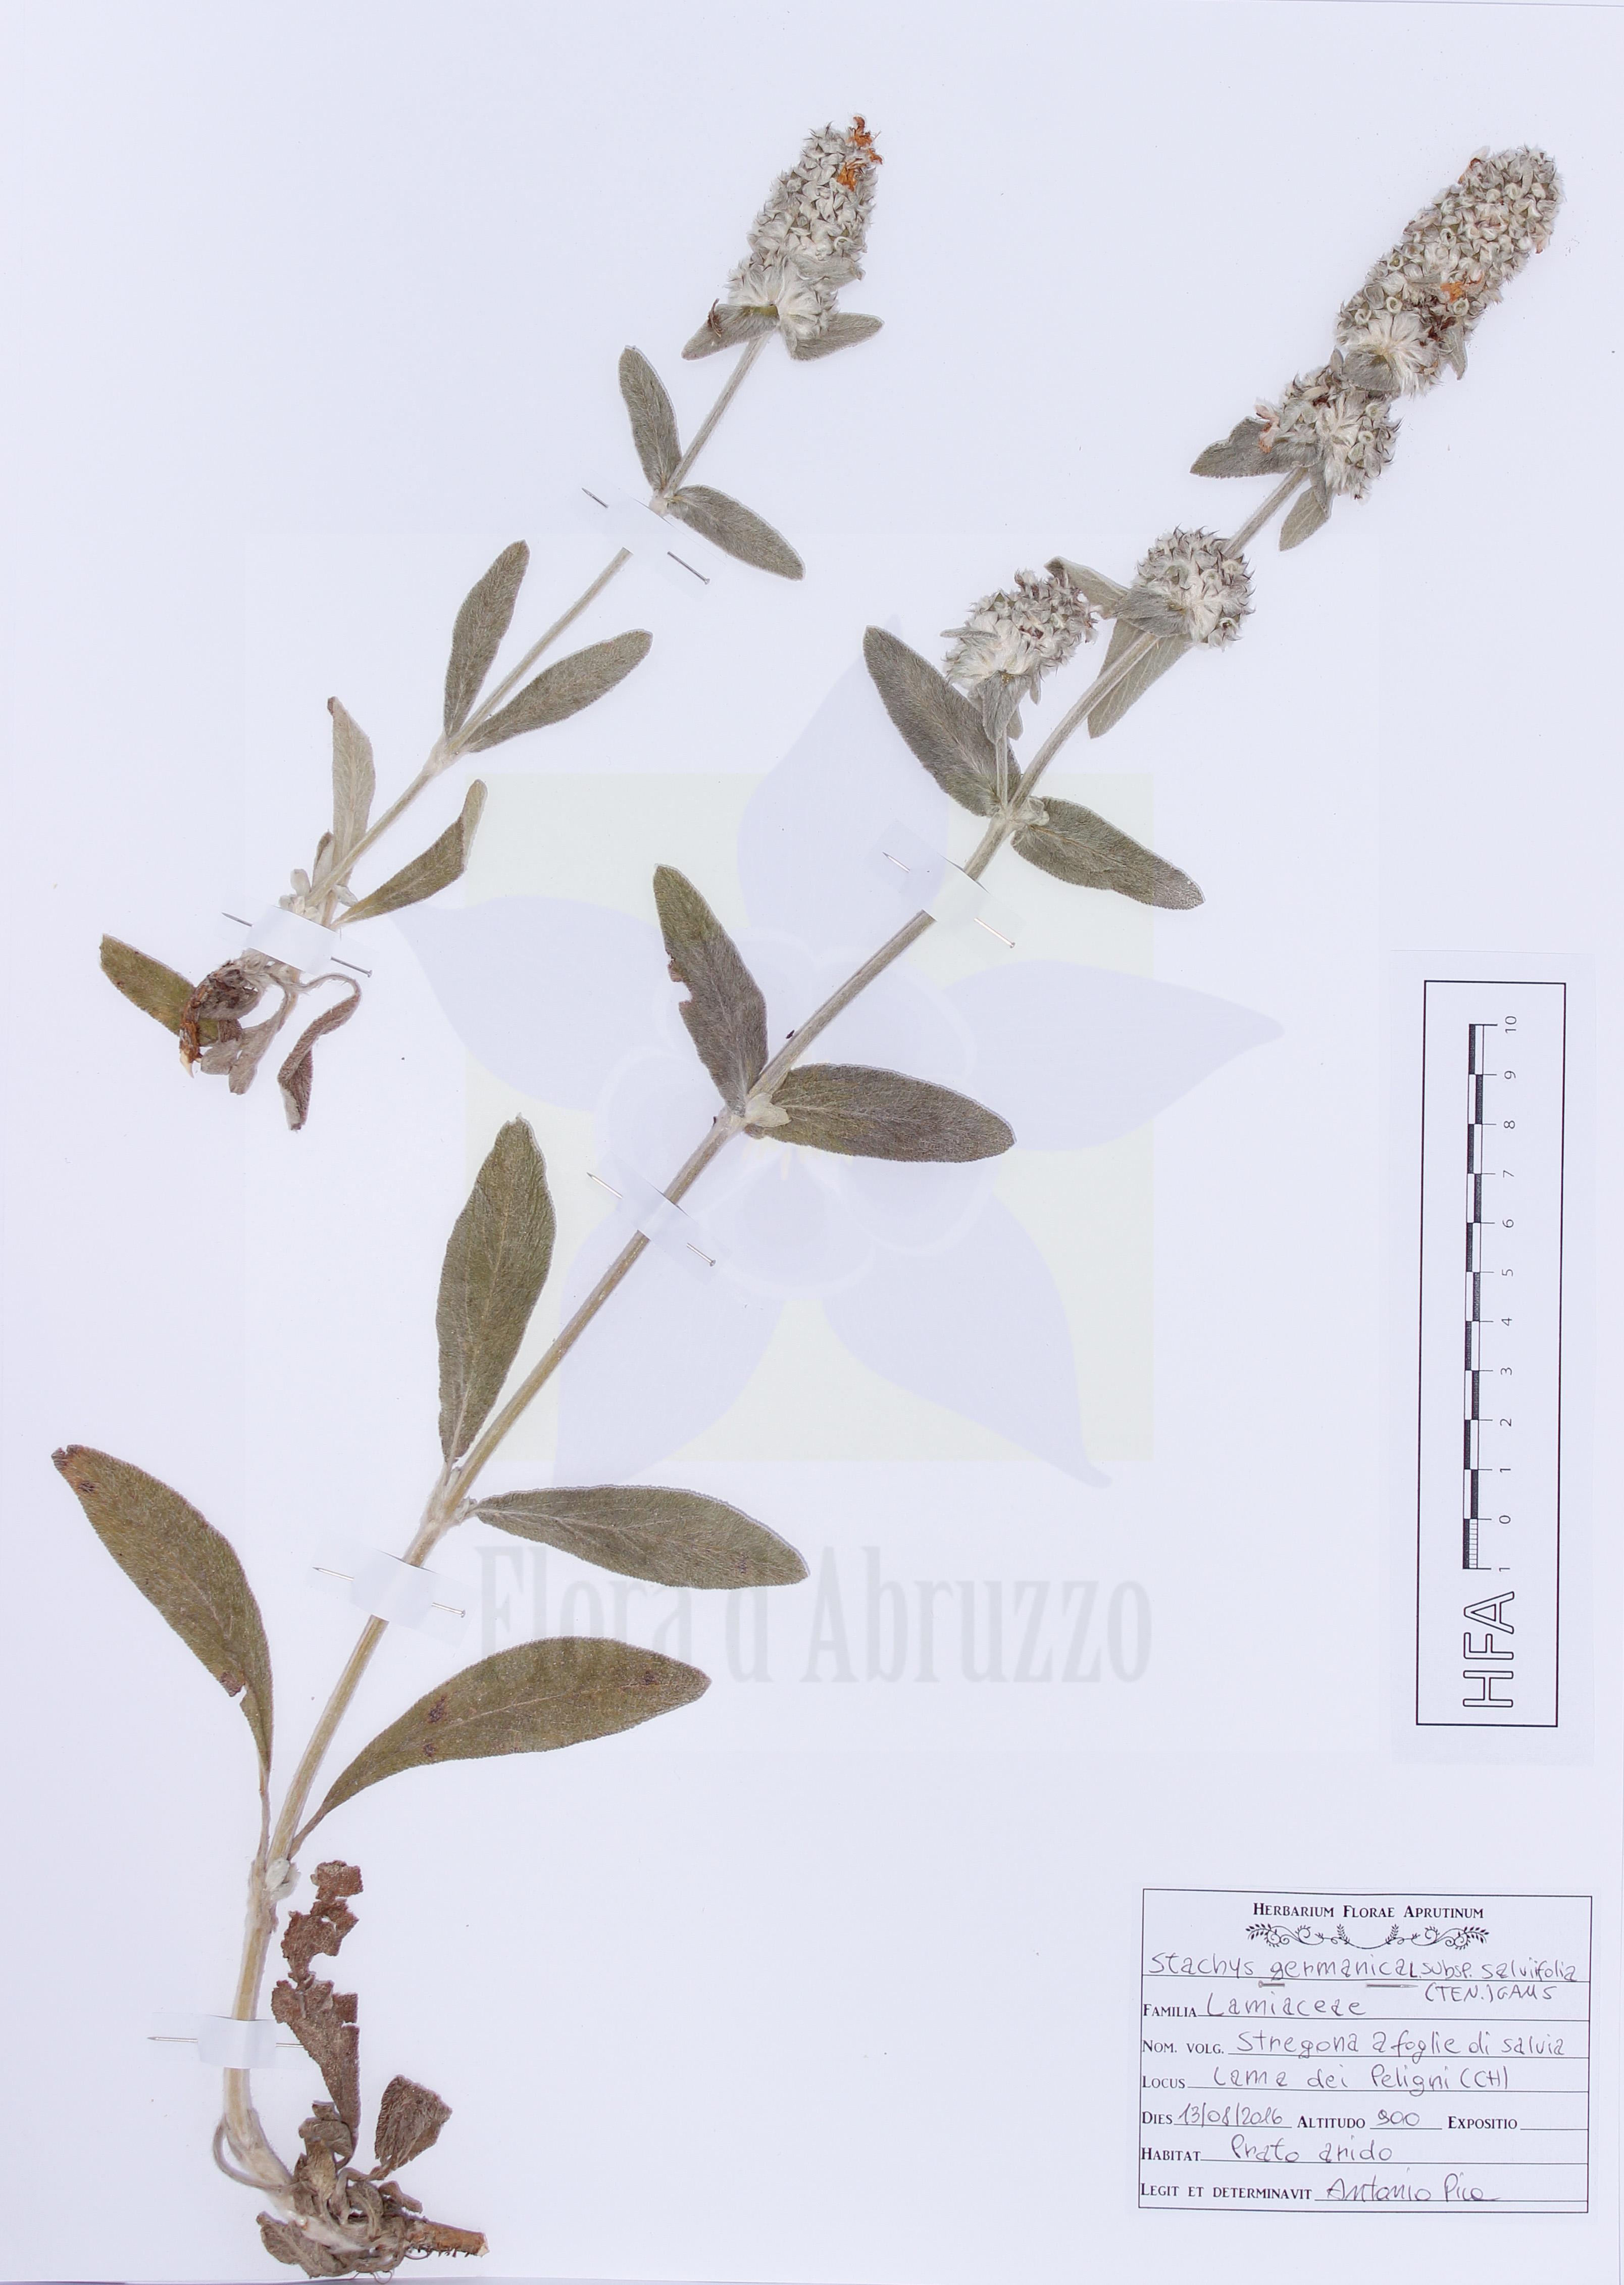 Stachys germanica L. subsp. salviifolia (Ten.) Gams